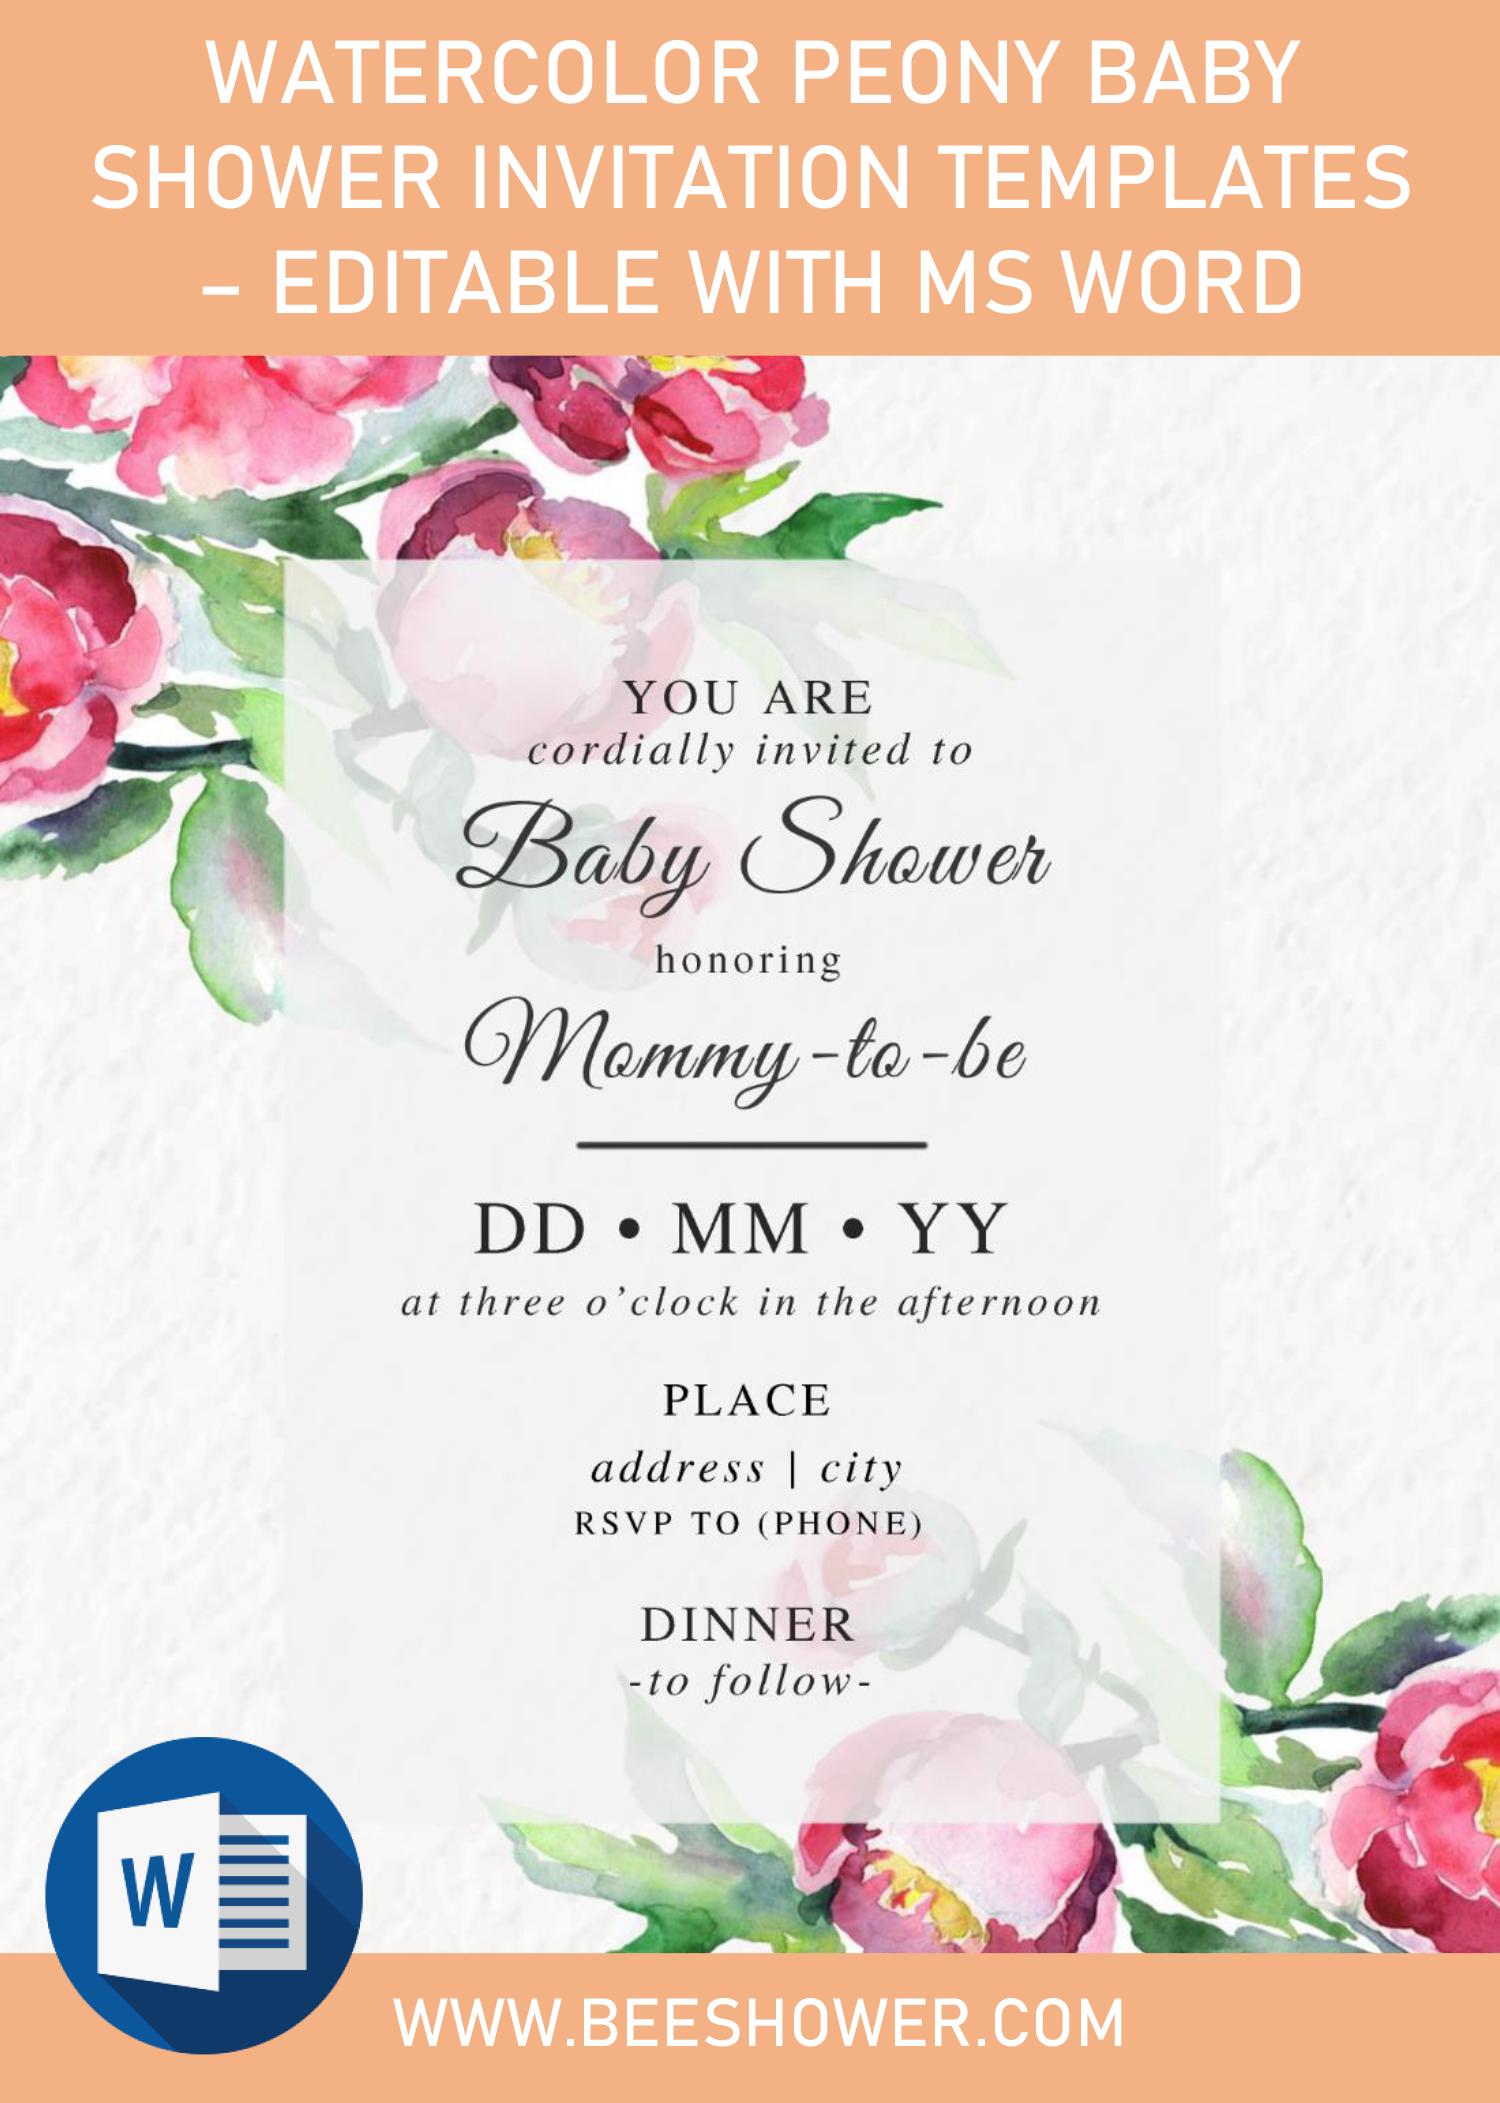 Watercolor Peony Baby Shower Invitation Templates Editable Wi Baby Shower Invitation Templates Baby Shower Invitations Free Printable Baby Shower Invitations